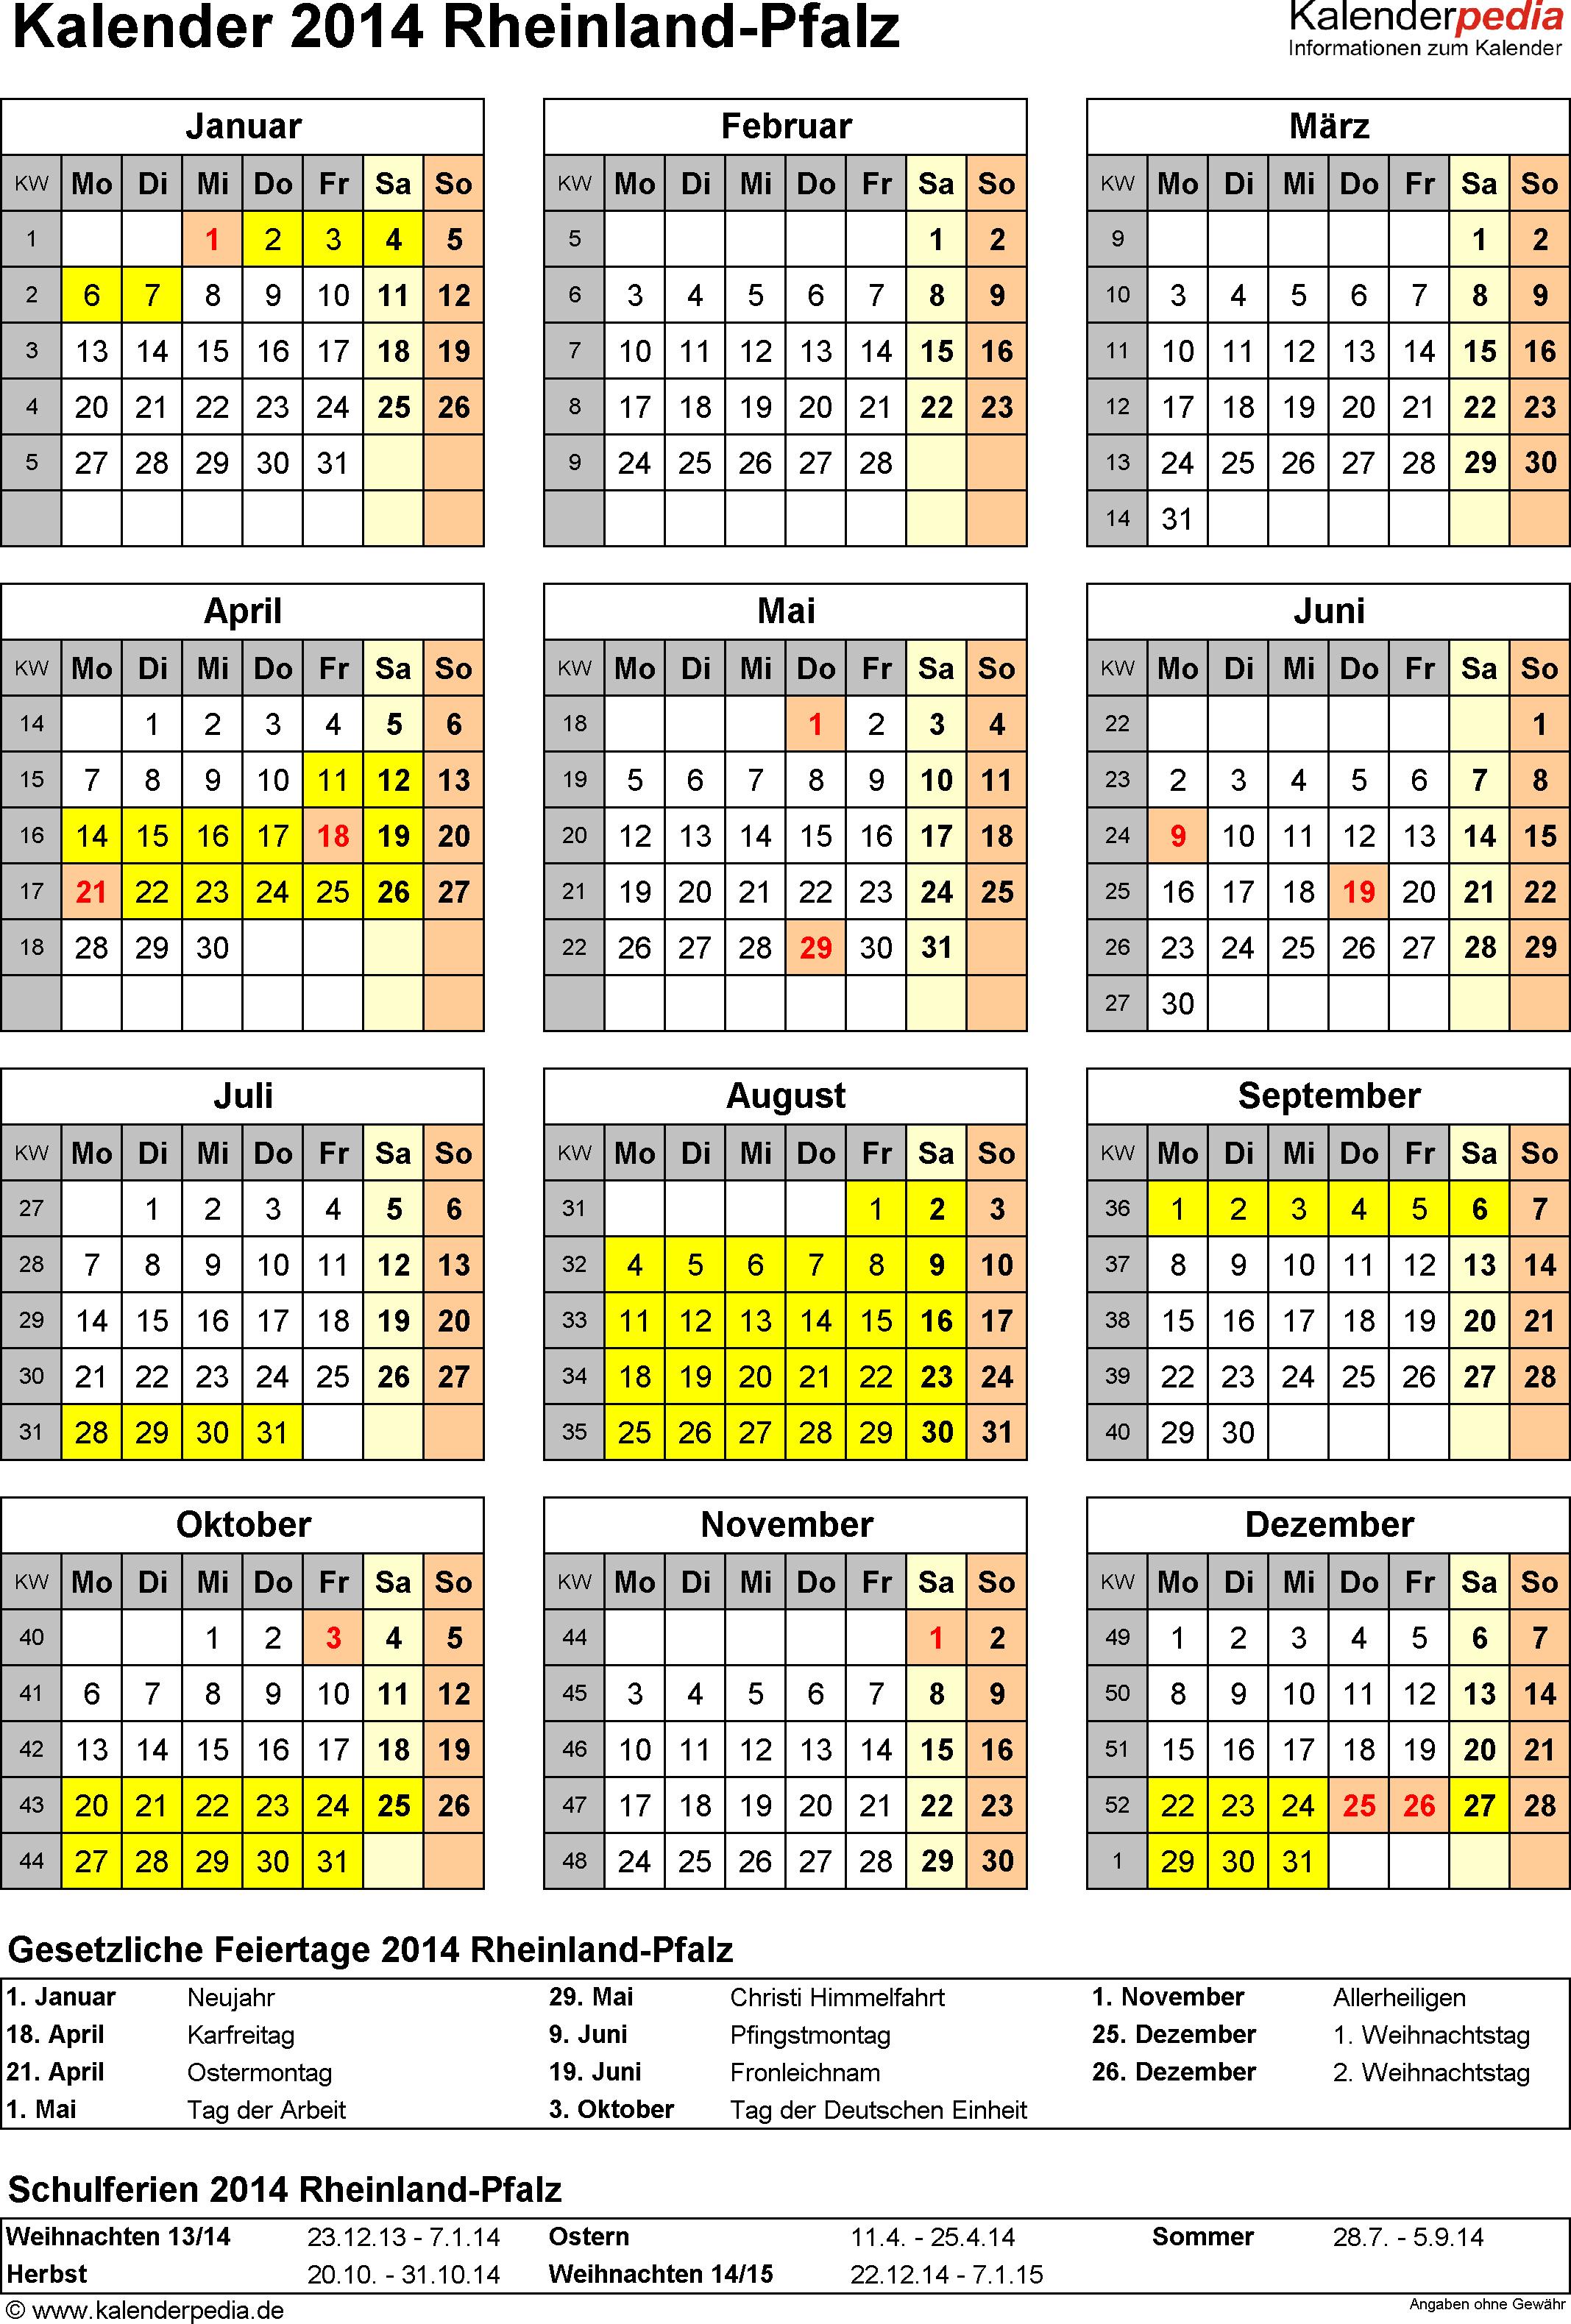 Kalender 2017/2018 Rheinland-Pfalz